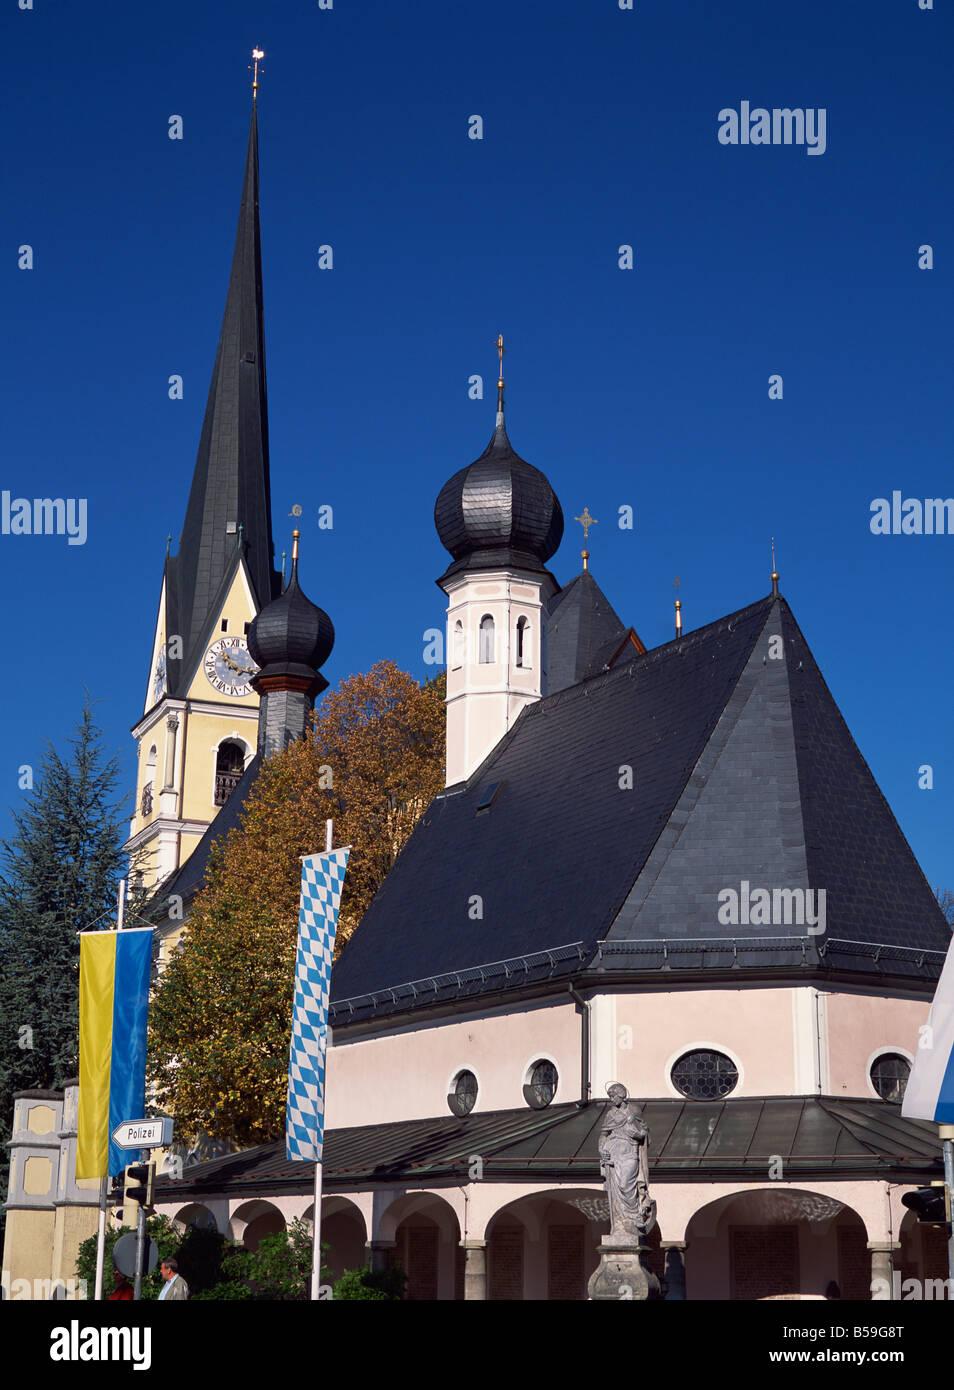 Prien Pfarkirche Maria Himmelfahrt, Chiemsee, Bavaria, Germany, Europe Stock Photo